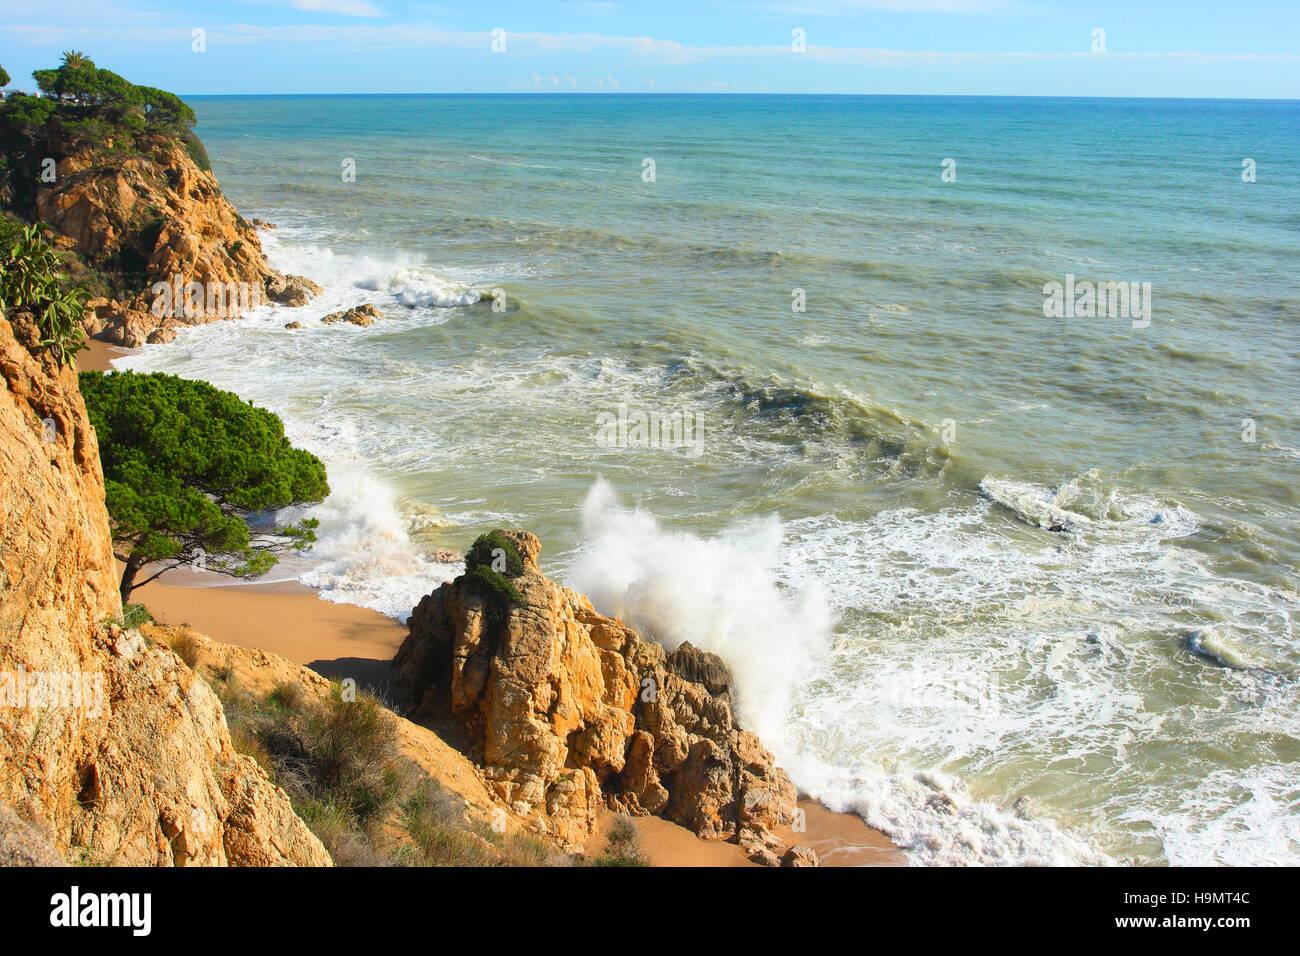 Sea storm on the Mediterranean Sea. Calella. Barcelona Province. Spain - Stock Image